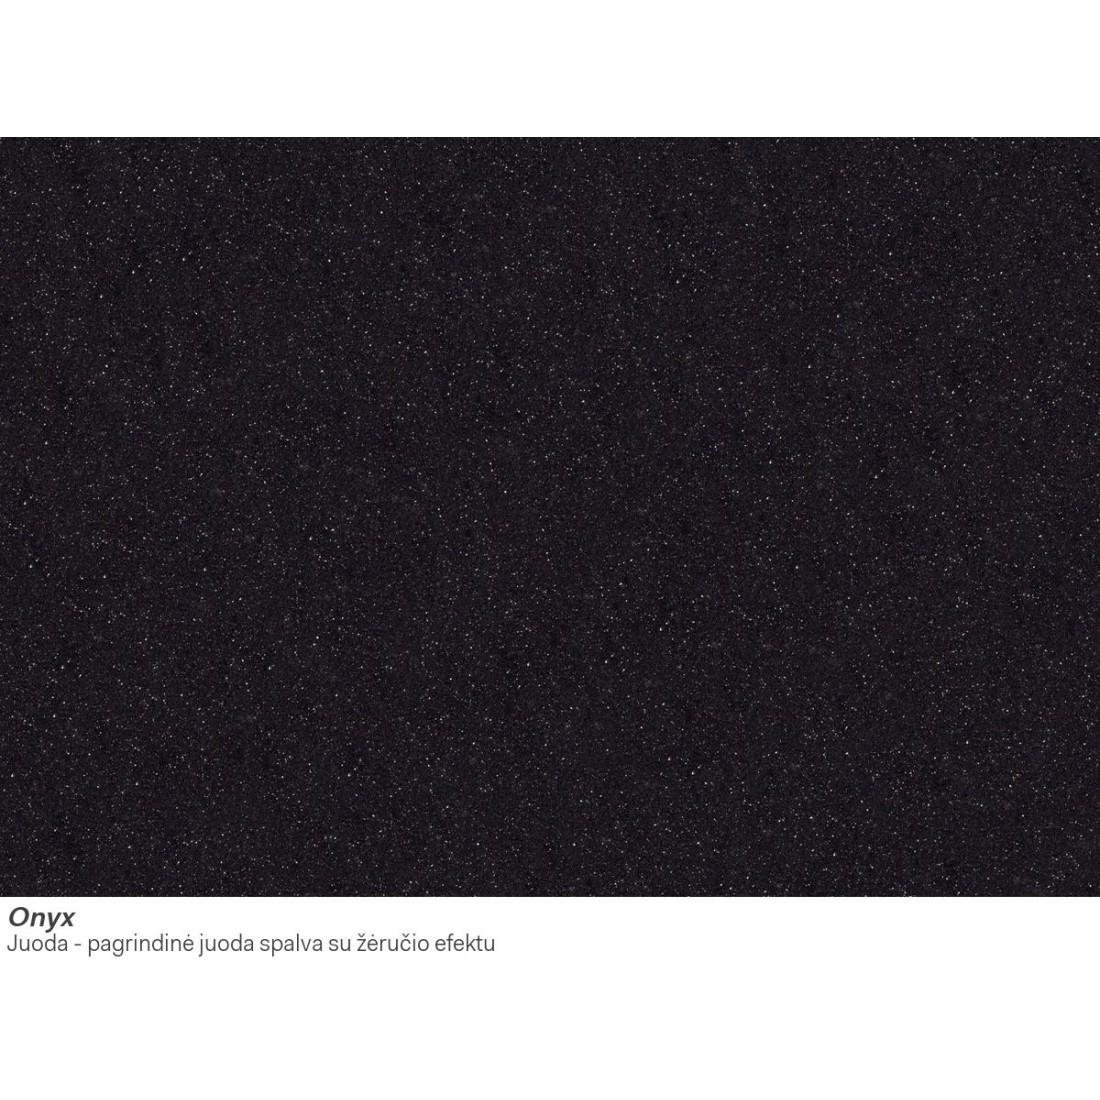 Akmens masės plautuvė Franke Basis BFG 611-78, Onyx